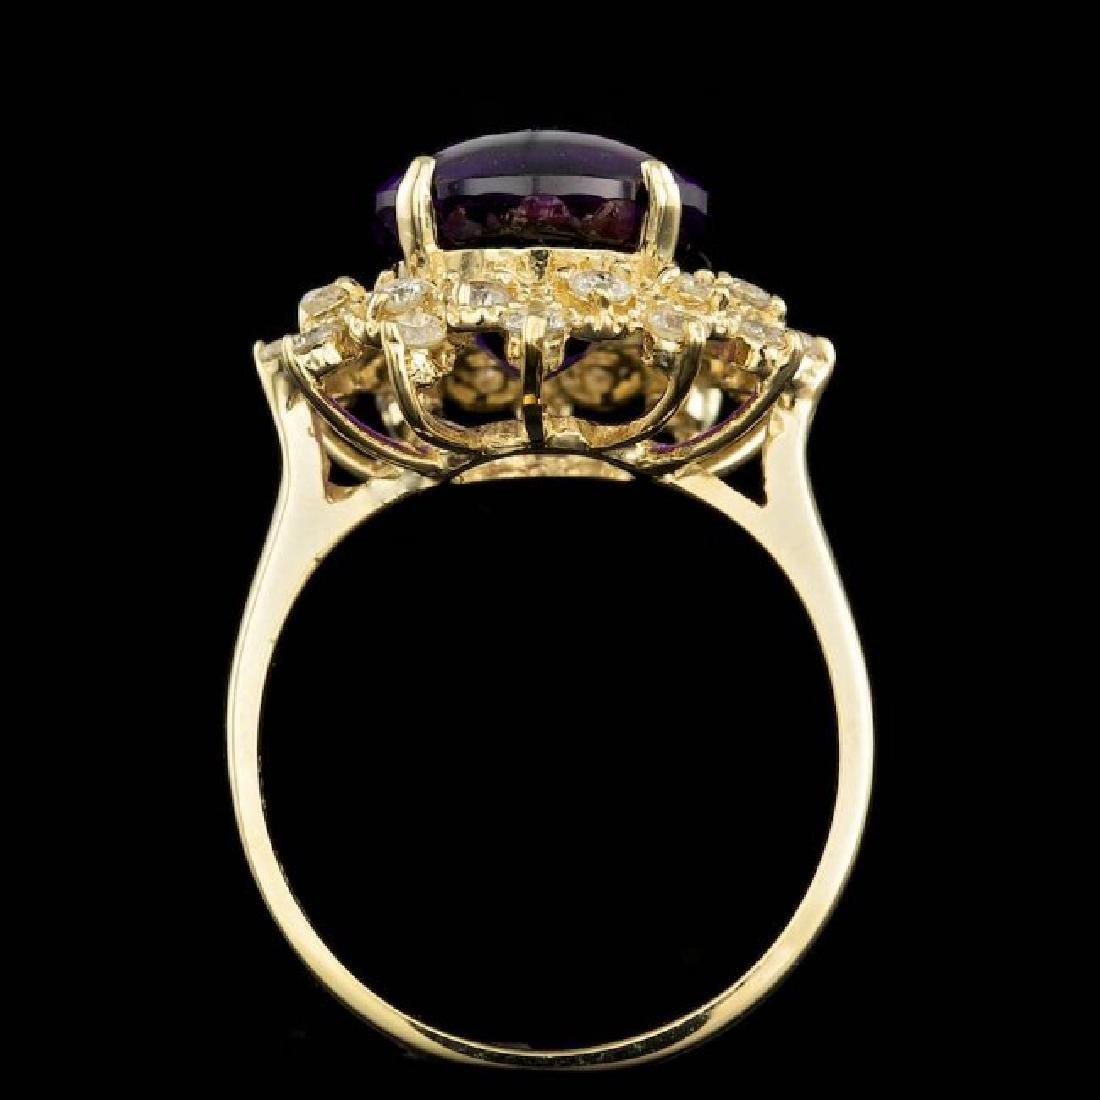 14k Gold 5.00ct Amethyst 0.70ct Diamond Ring - 3